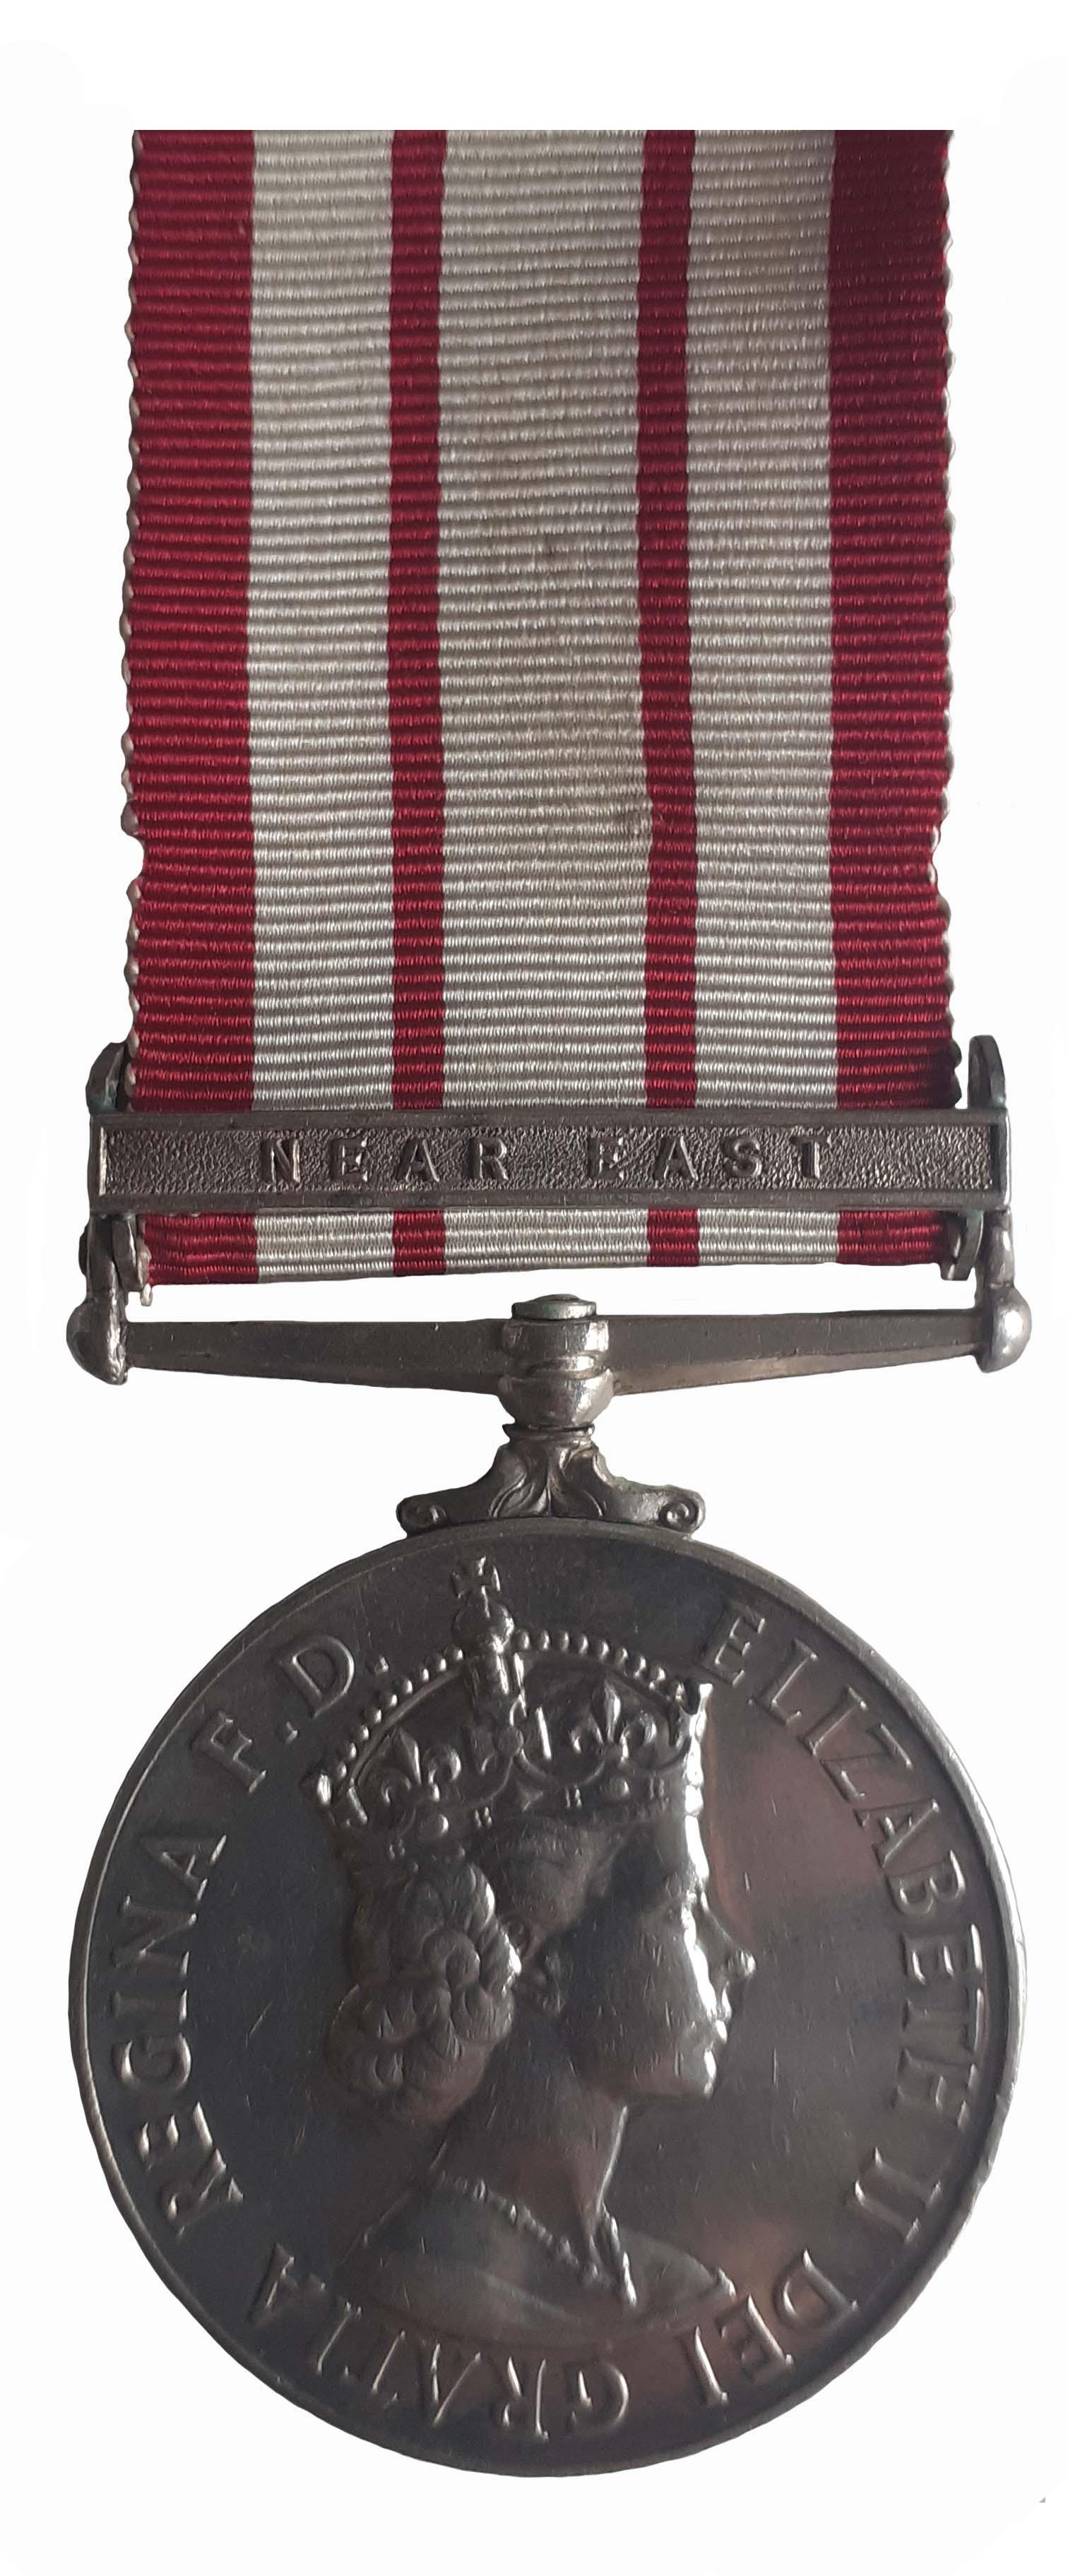 Naval General Service Medal 1909-62, EiiR, to Control Electrical Artificer M. Davis